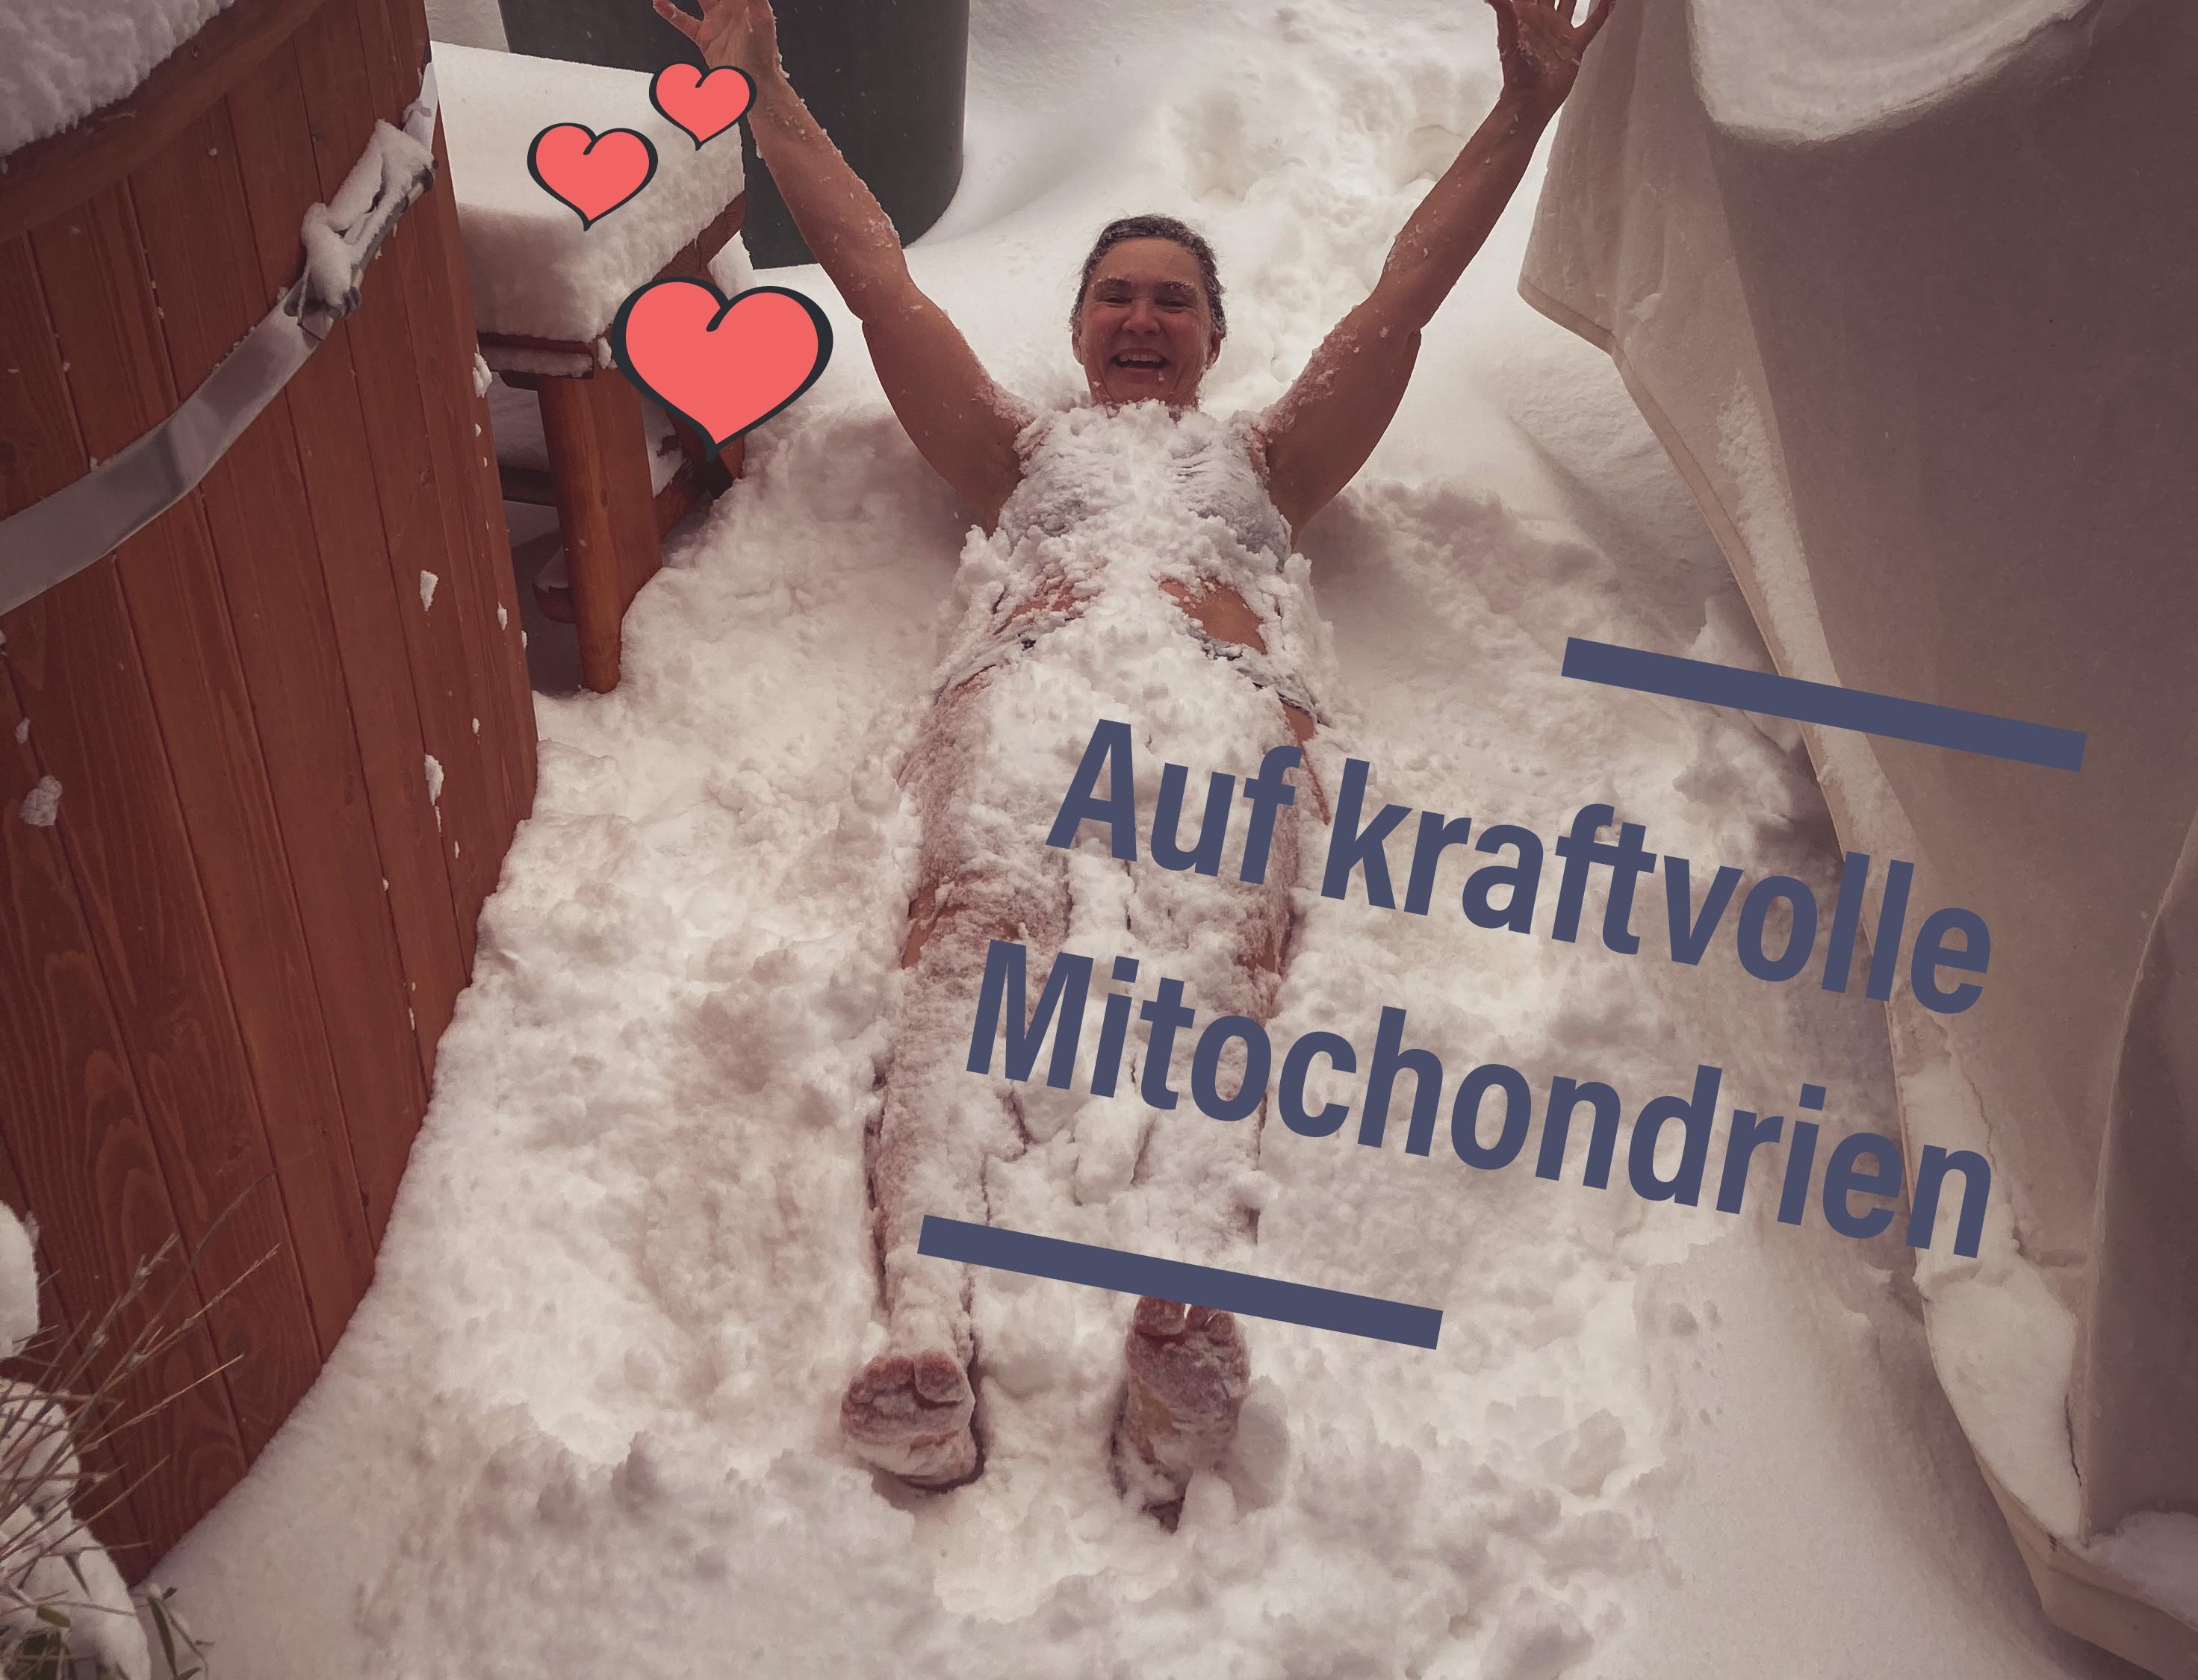 Mitochondrien Training